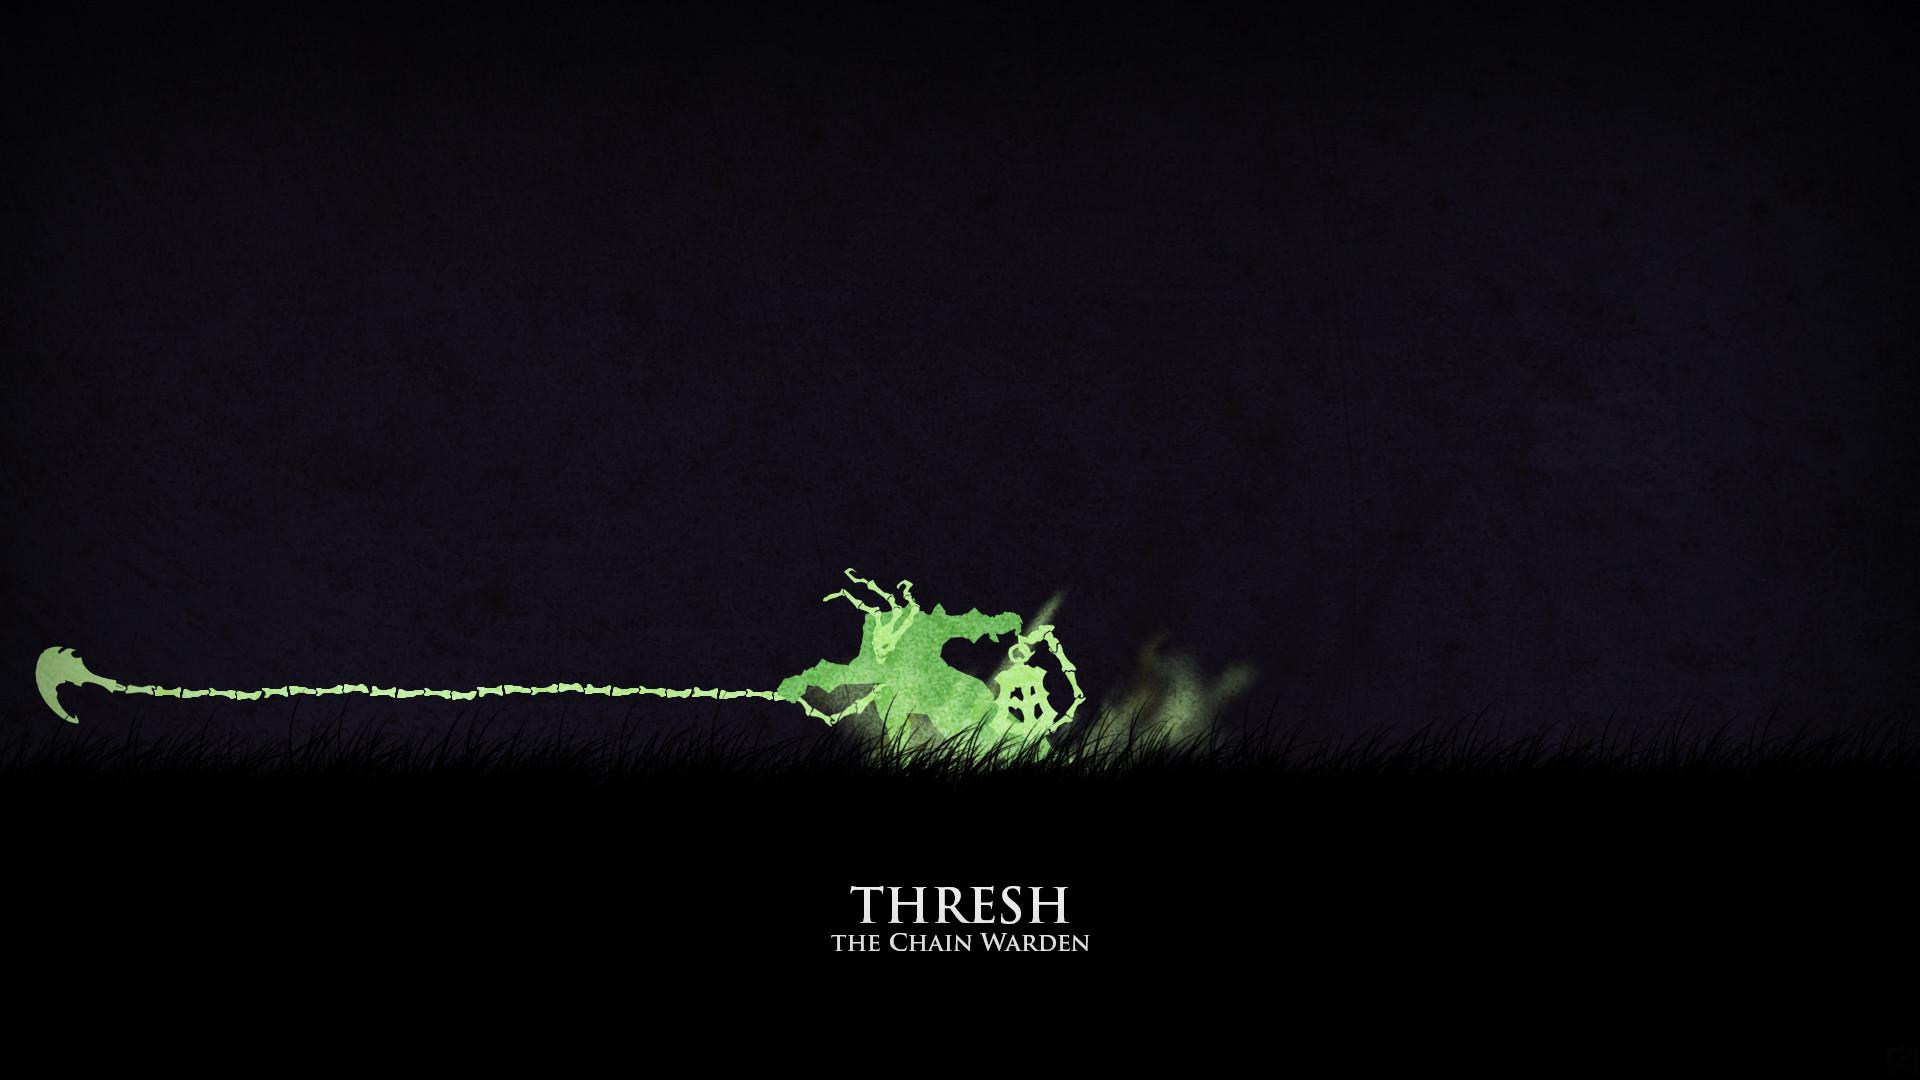 Thresh Wallpaper 1920x1080 85 Images